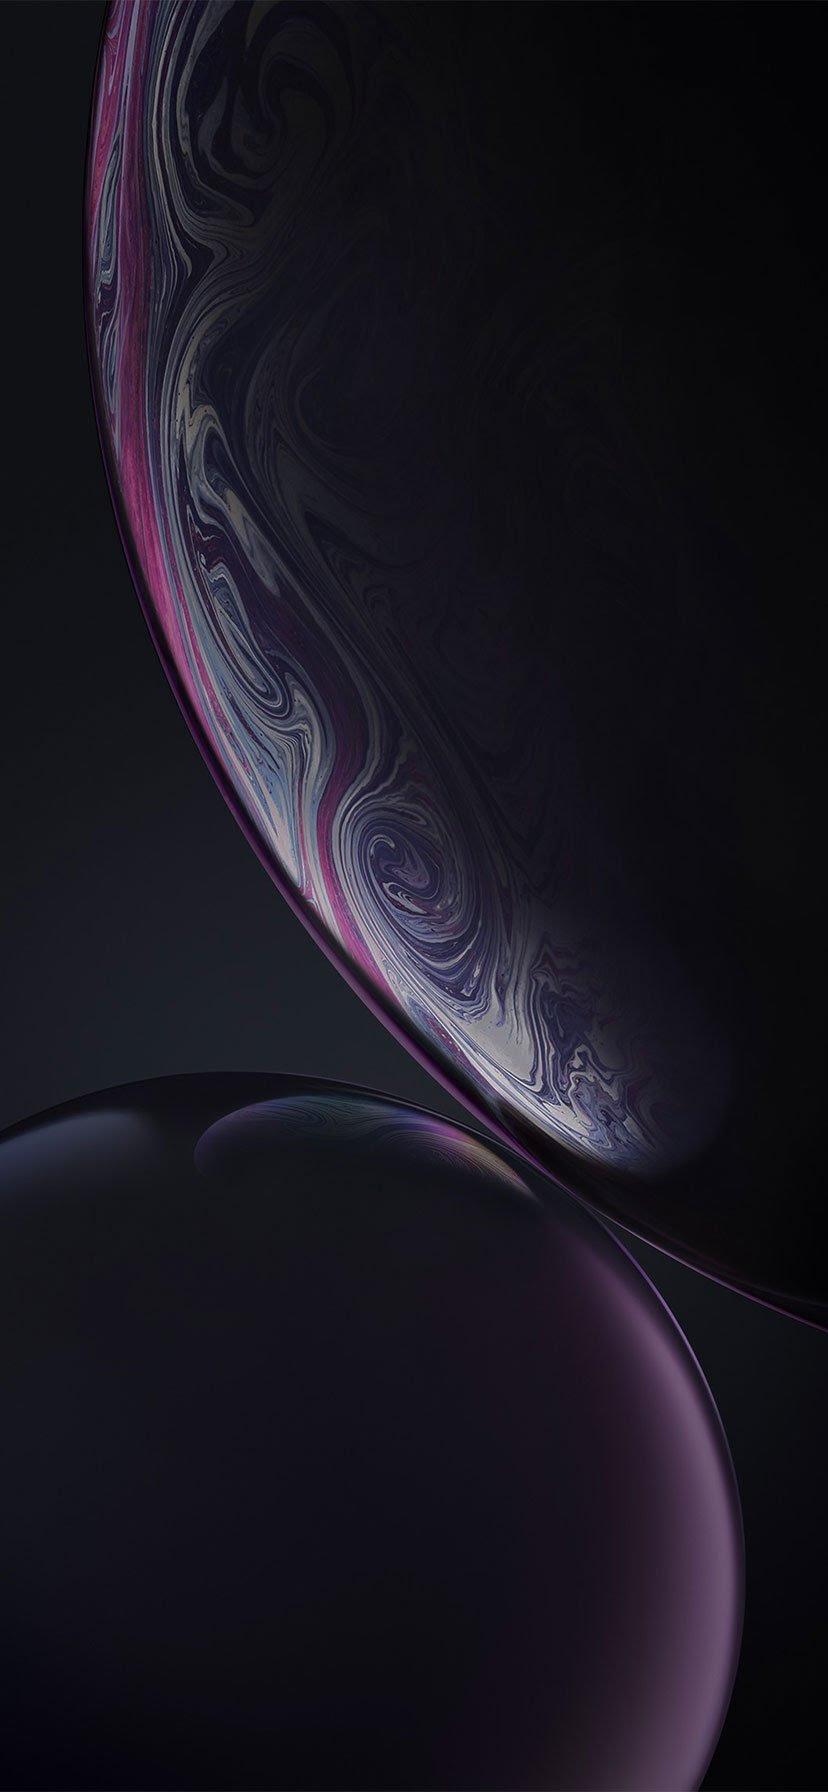 50+ Best High Quality iPhone XR Wallpapers & Backgrounds - Designbolts